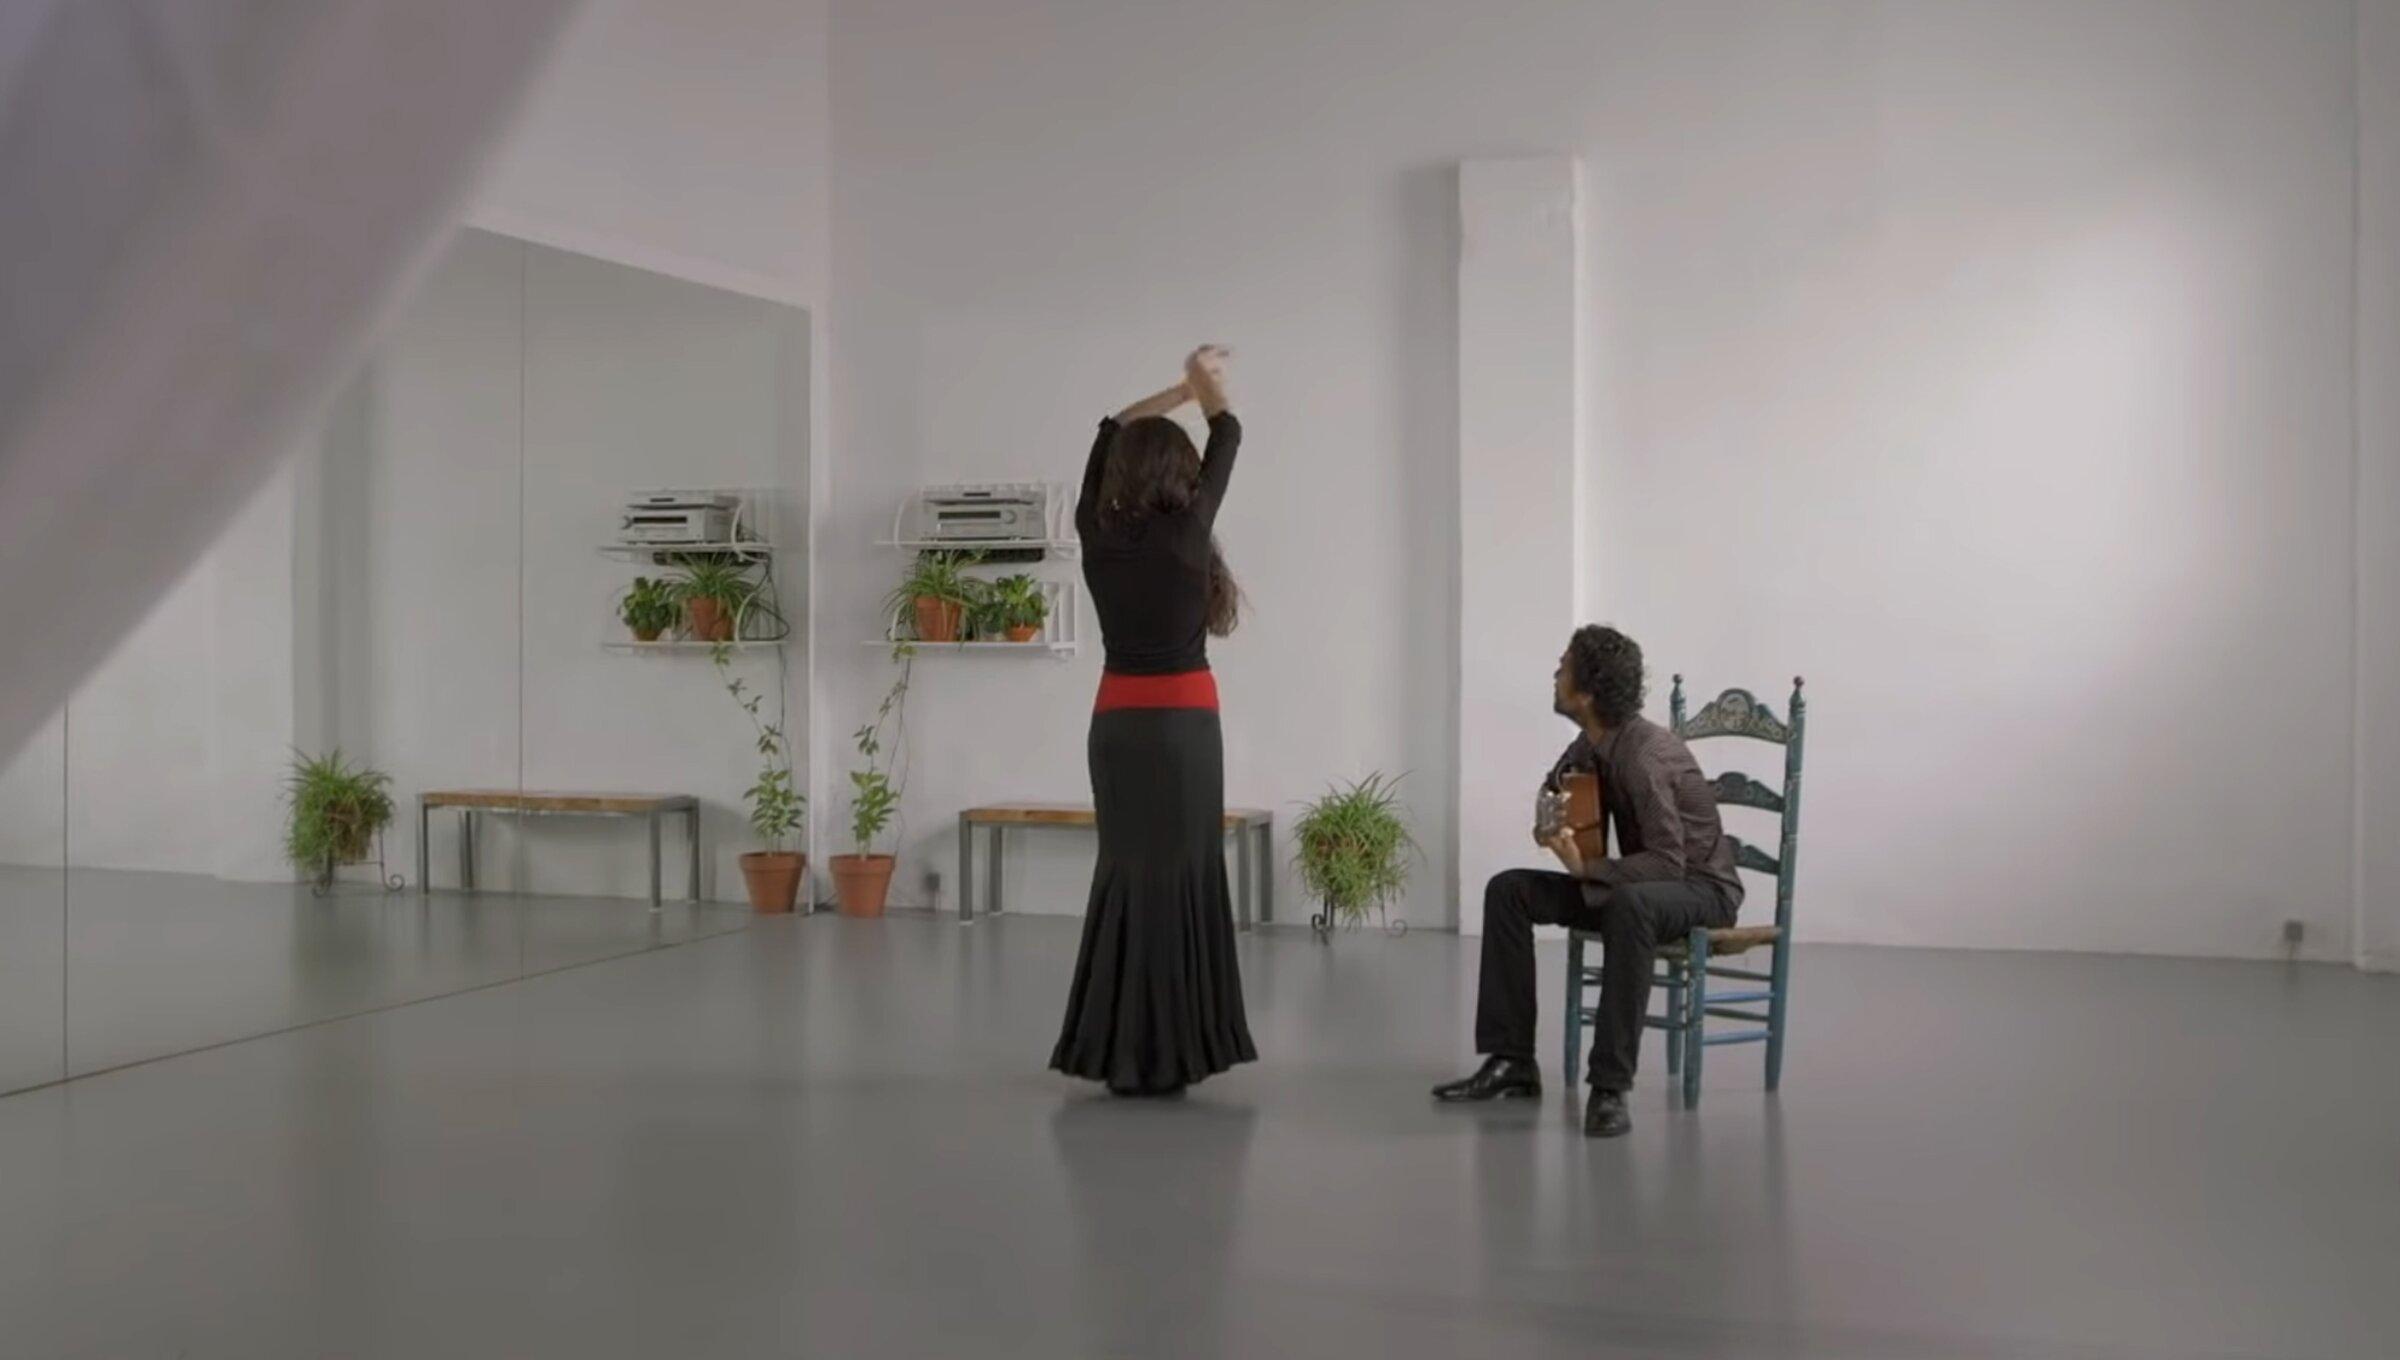 La vida flamenca – why art and daily life are inseparable for a flamenco guitarist | Psyche